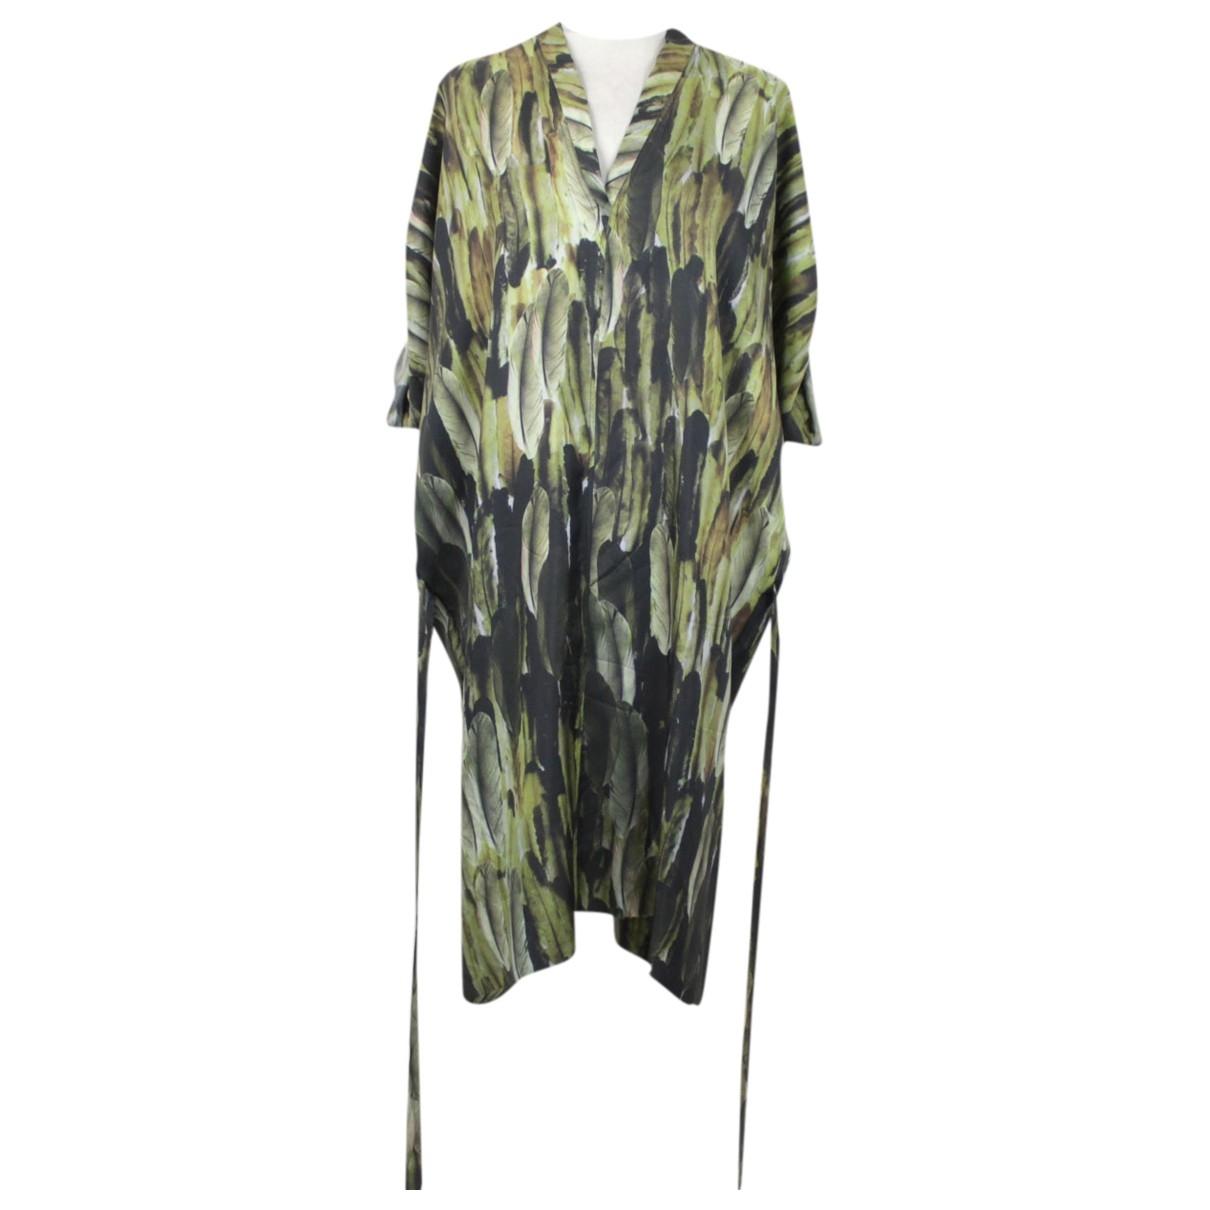 Isabel Marant \N Green Silk dress for Women S International